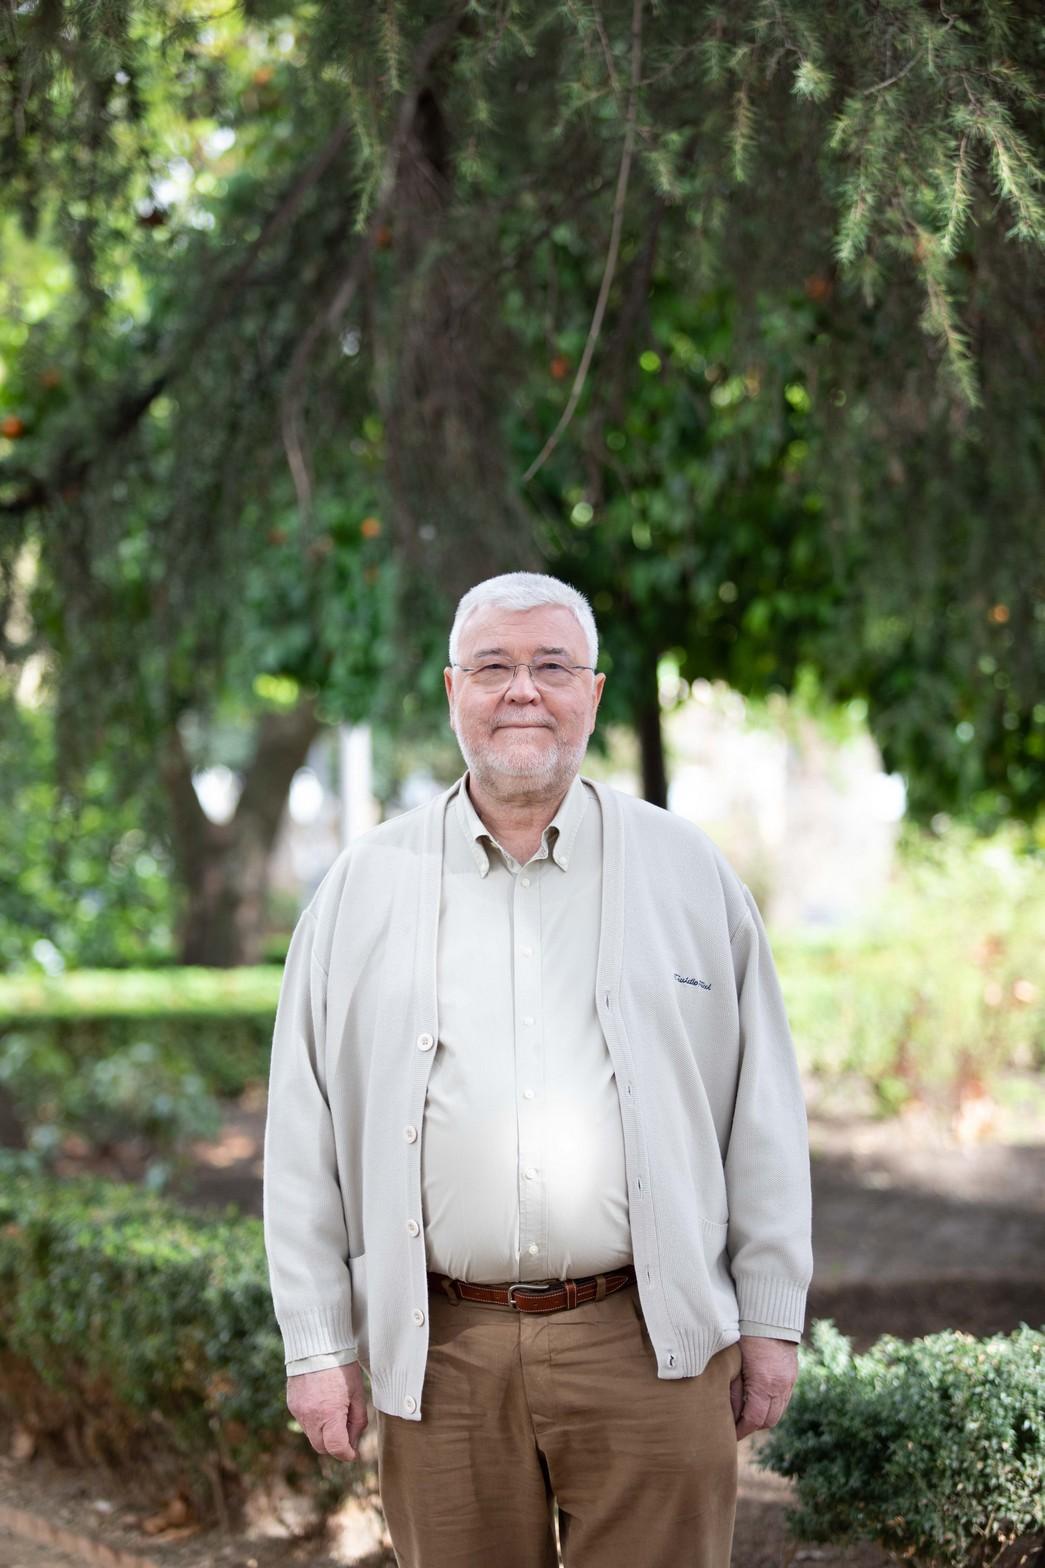 MANUEL RODRÍGUEZ ELVIRA